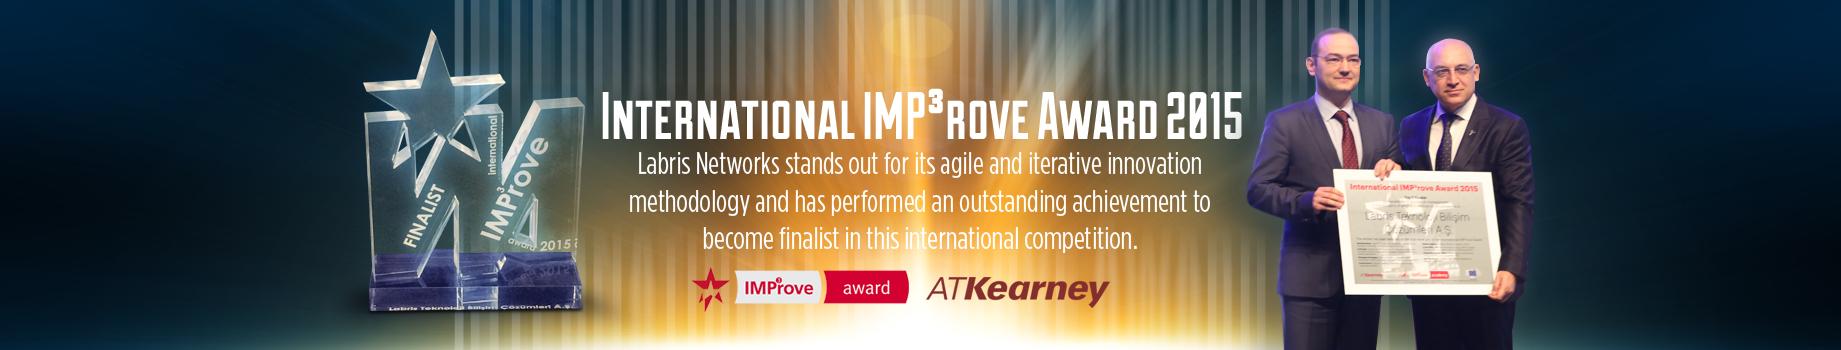 201512_IMP³rove-Award_Labris_Promo_ENG